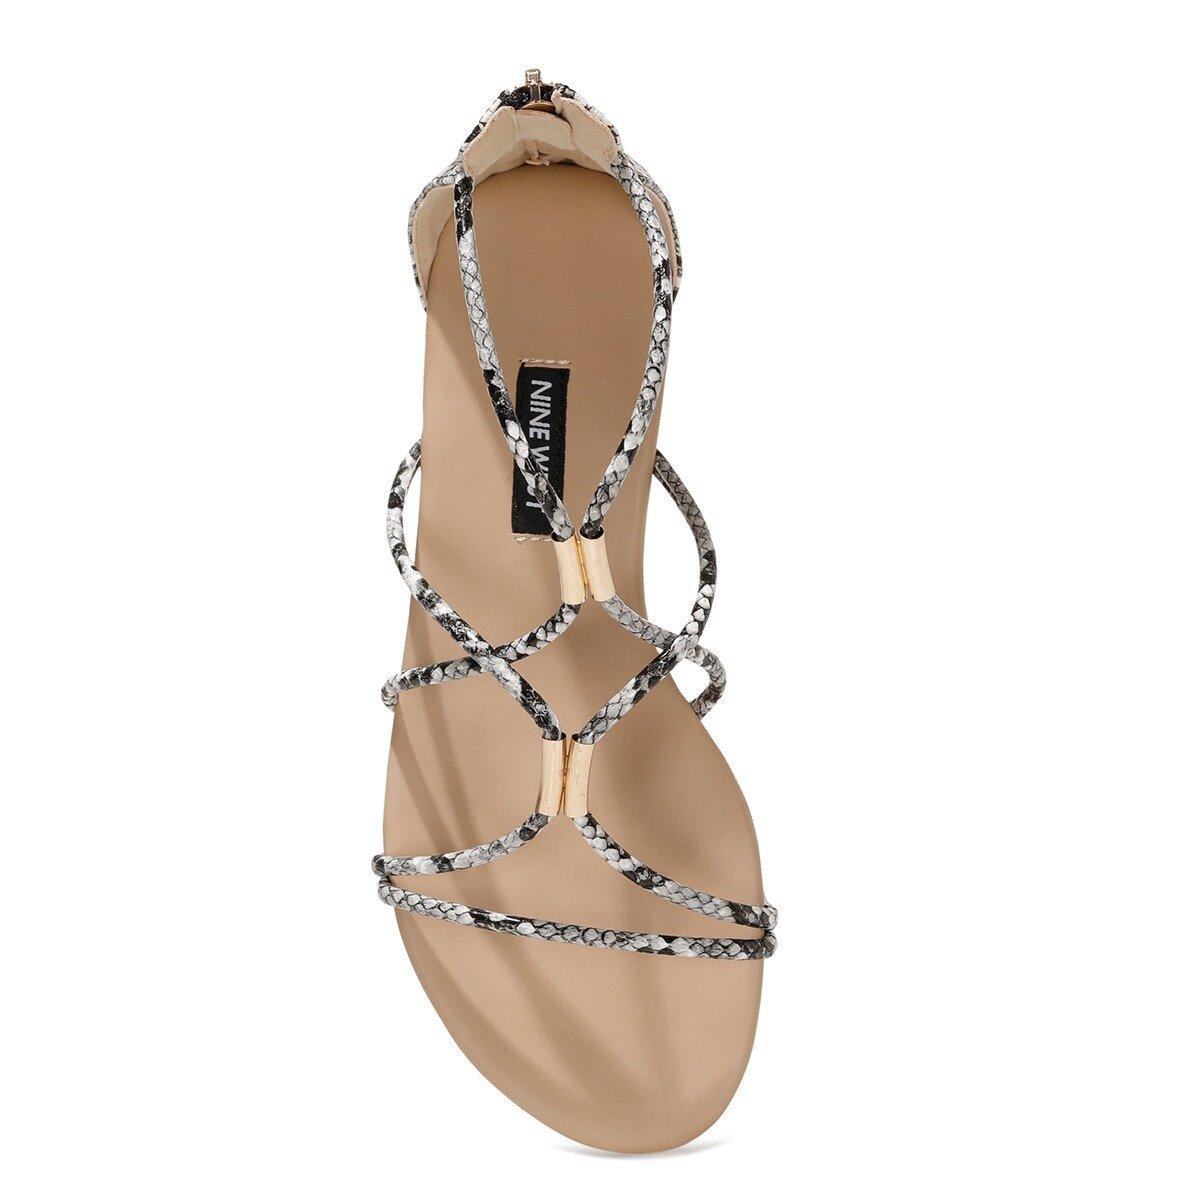 WOINIA 1FX Siyah Kadın Sandalet